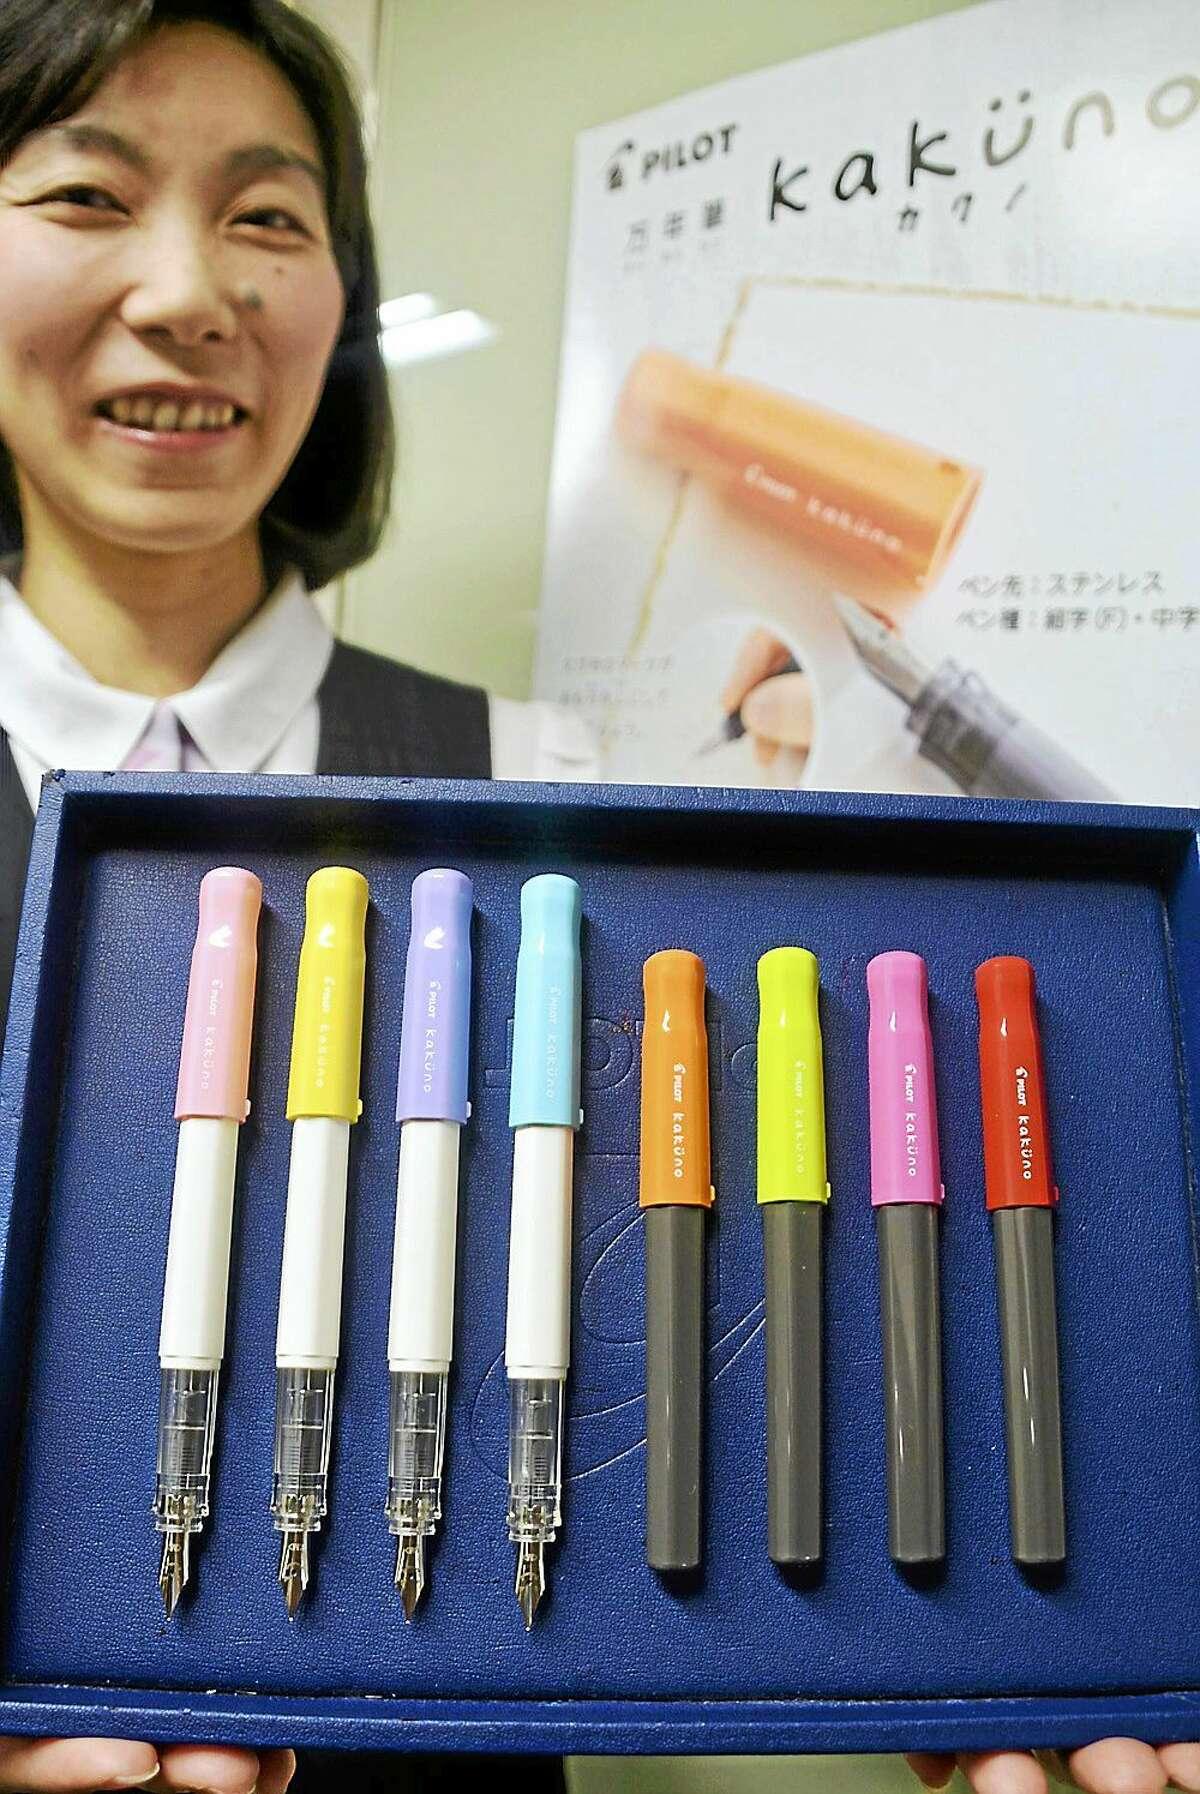 Fountain pens are enjoying new life. Here, Pilot Corp.ís kakuno fountain pens.